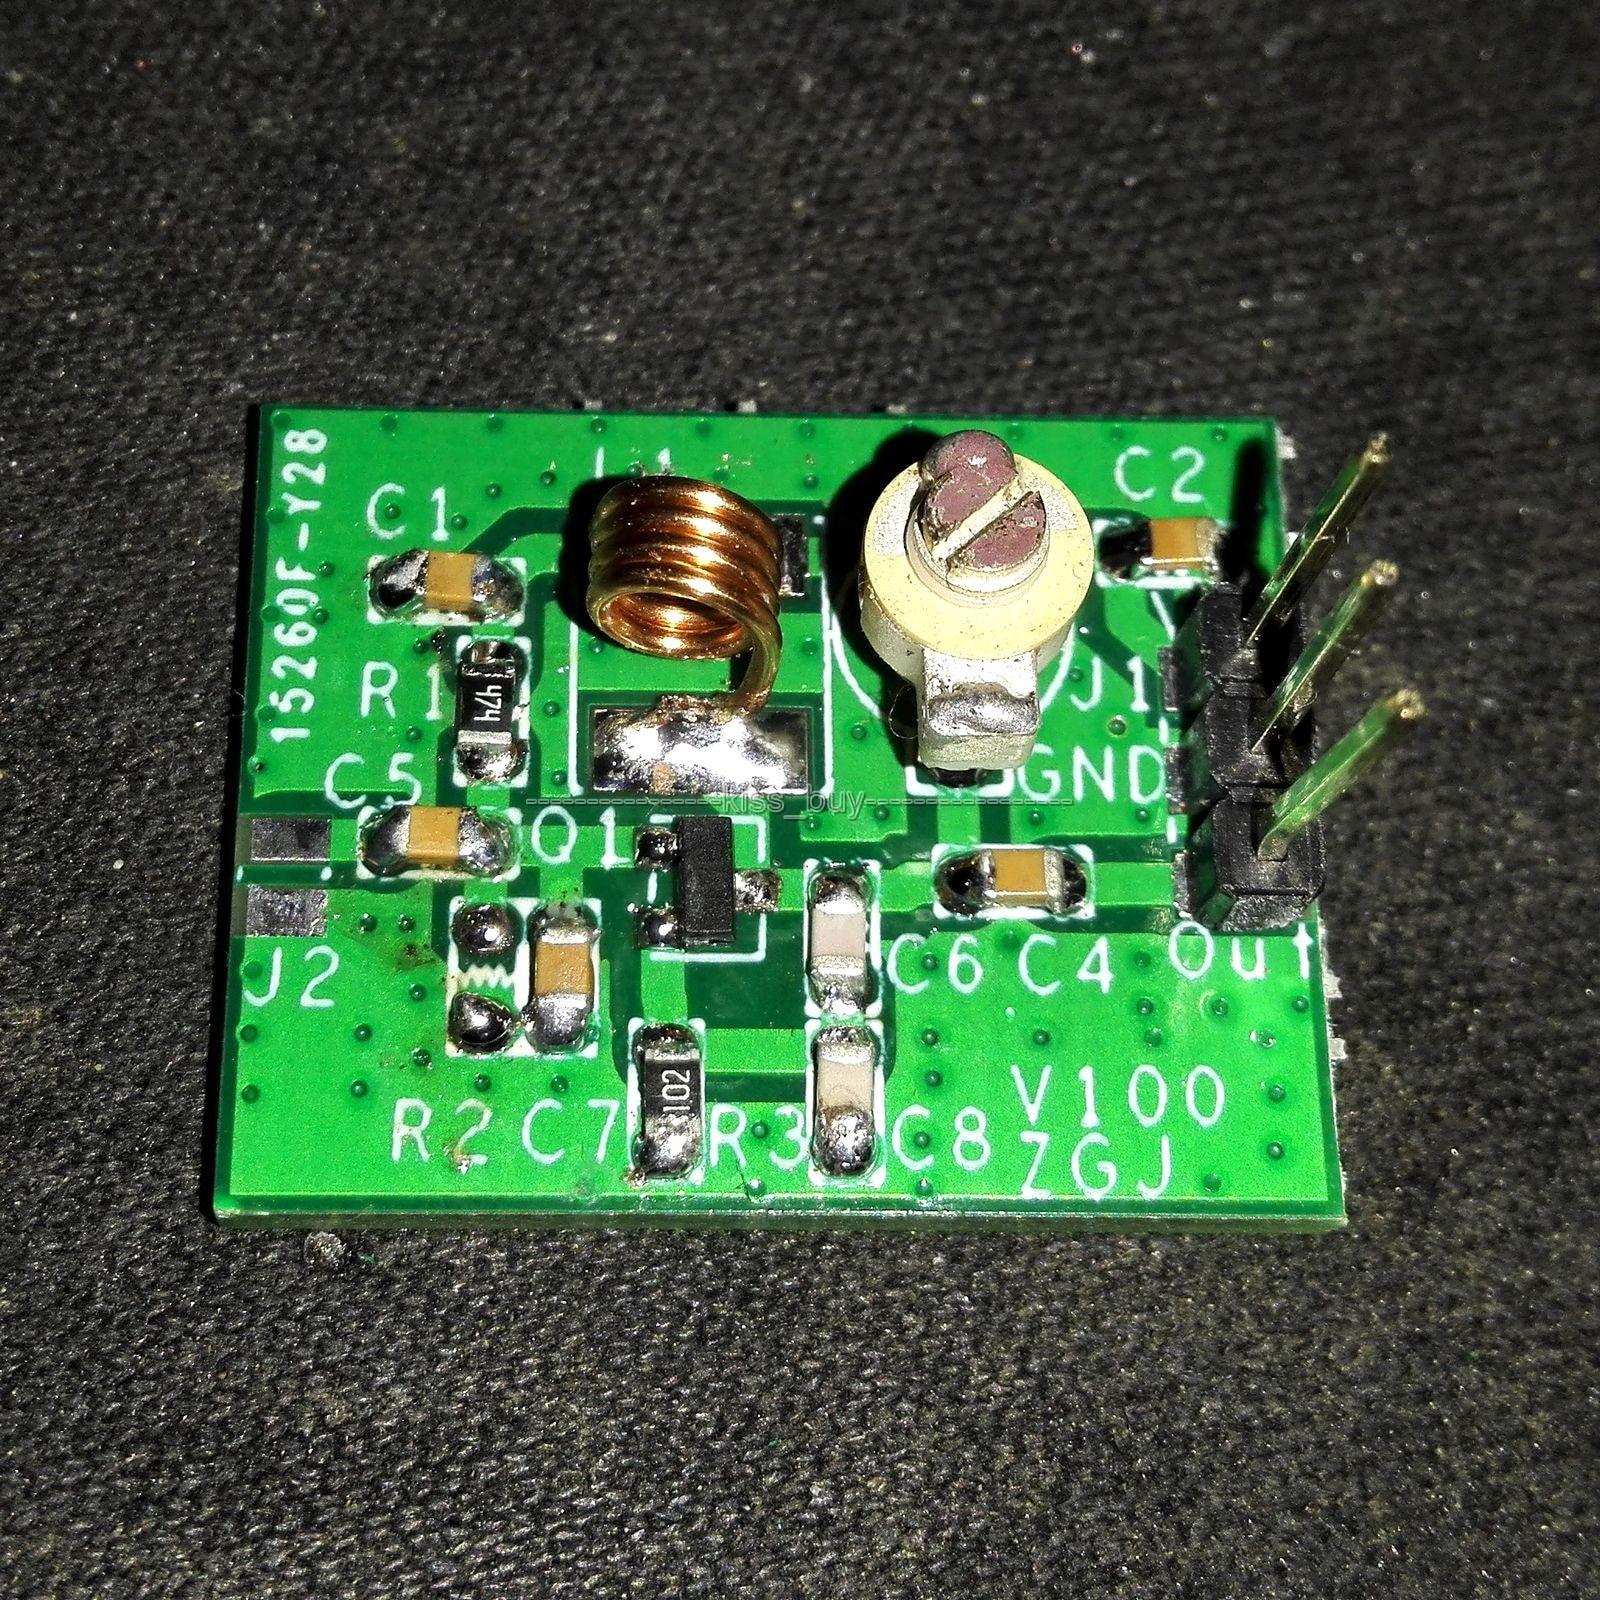 Dc 5v Bh1417f Fm Radio Transmitter Module Pll Stereo Digital Integrated Circuit Station Board 2sc9018 Oscillator Signal Source Mp3 80 120mhz Kits